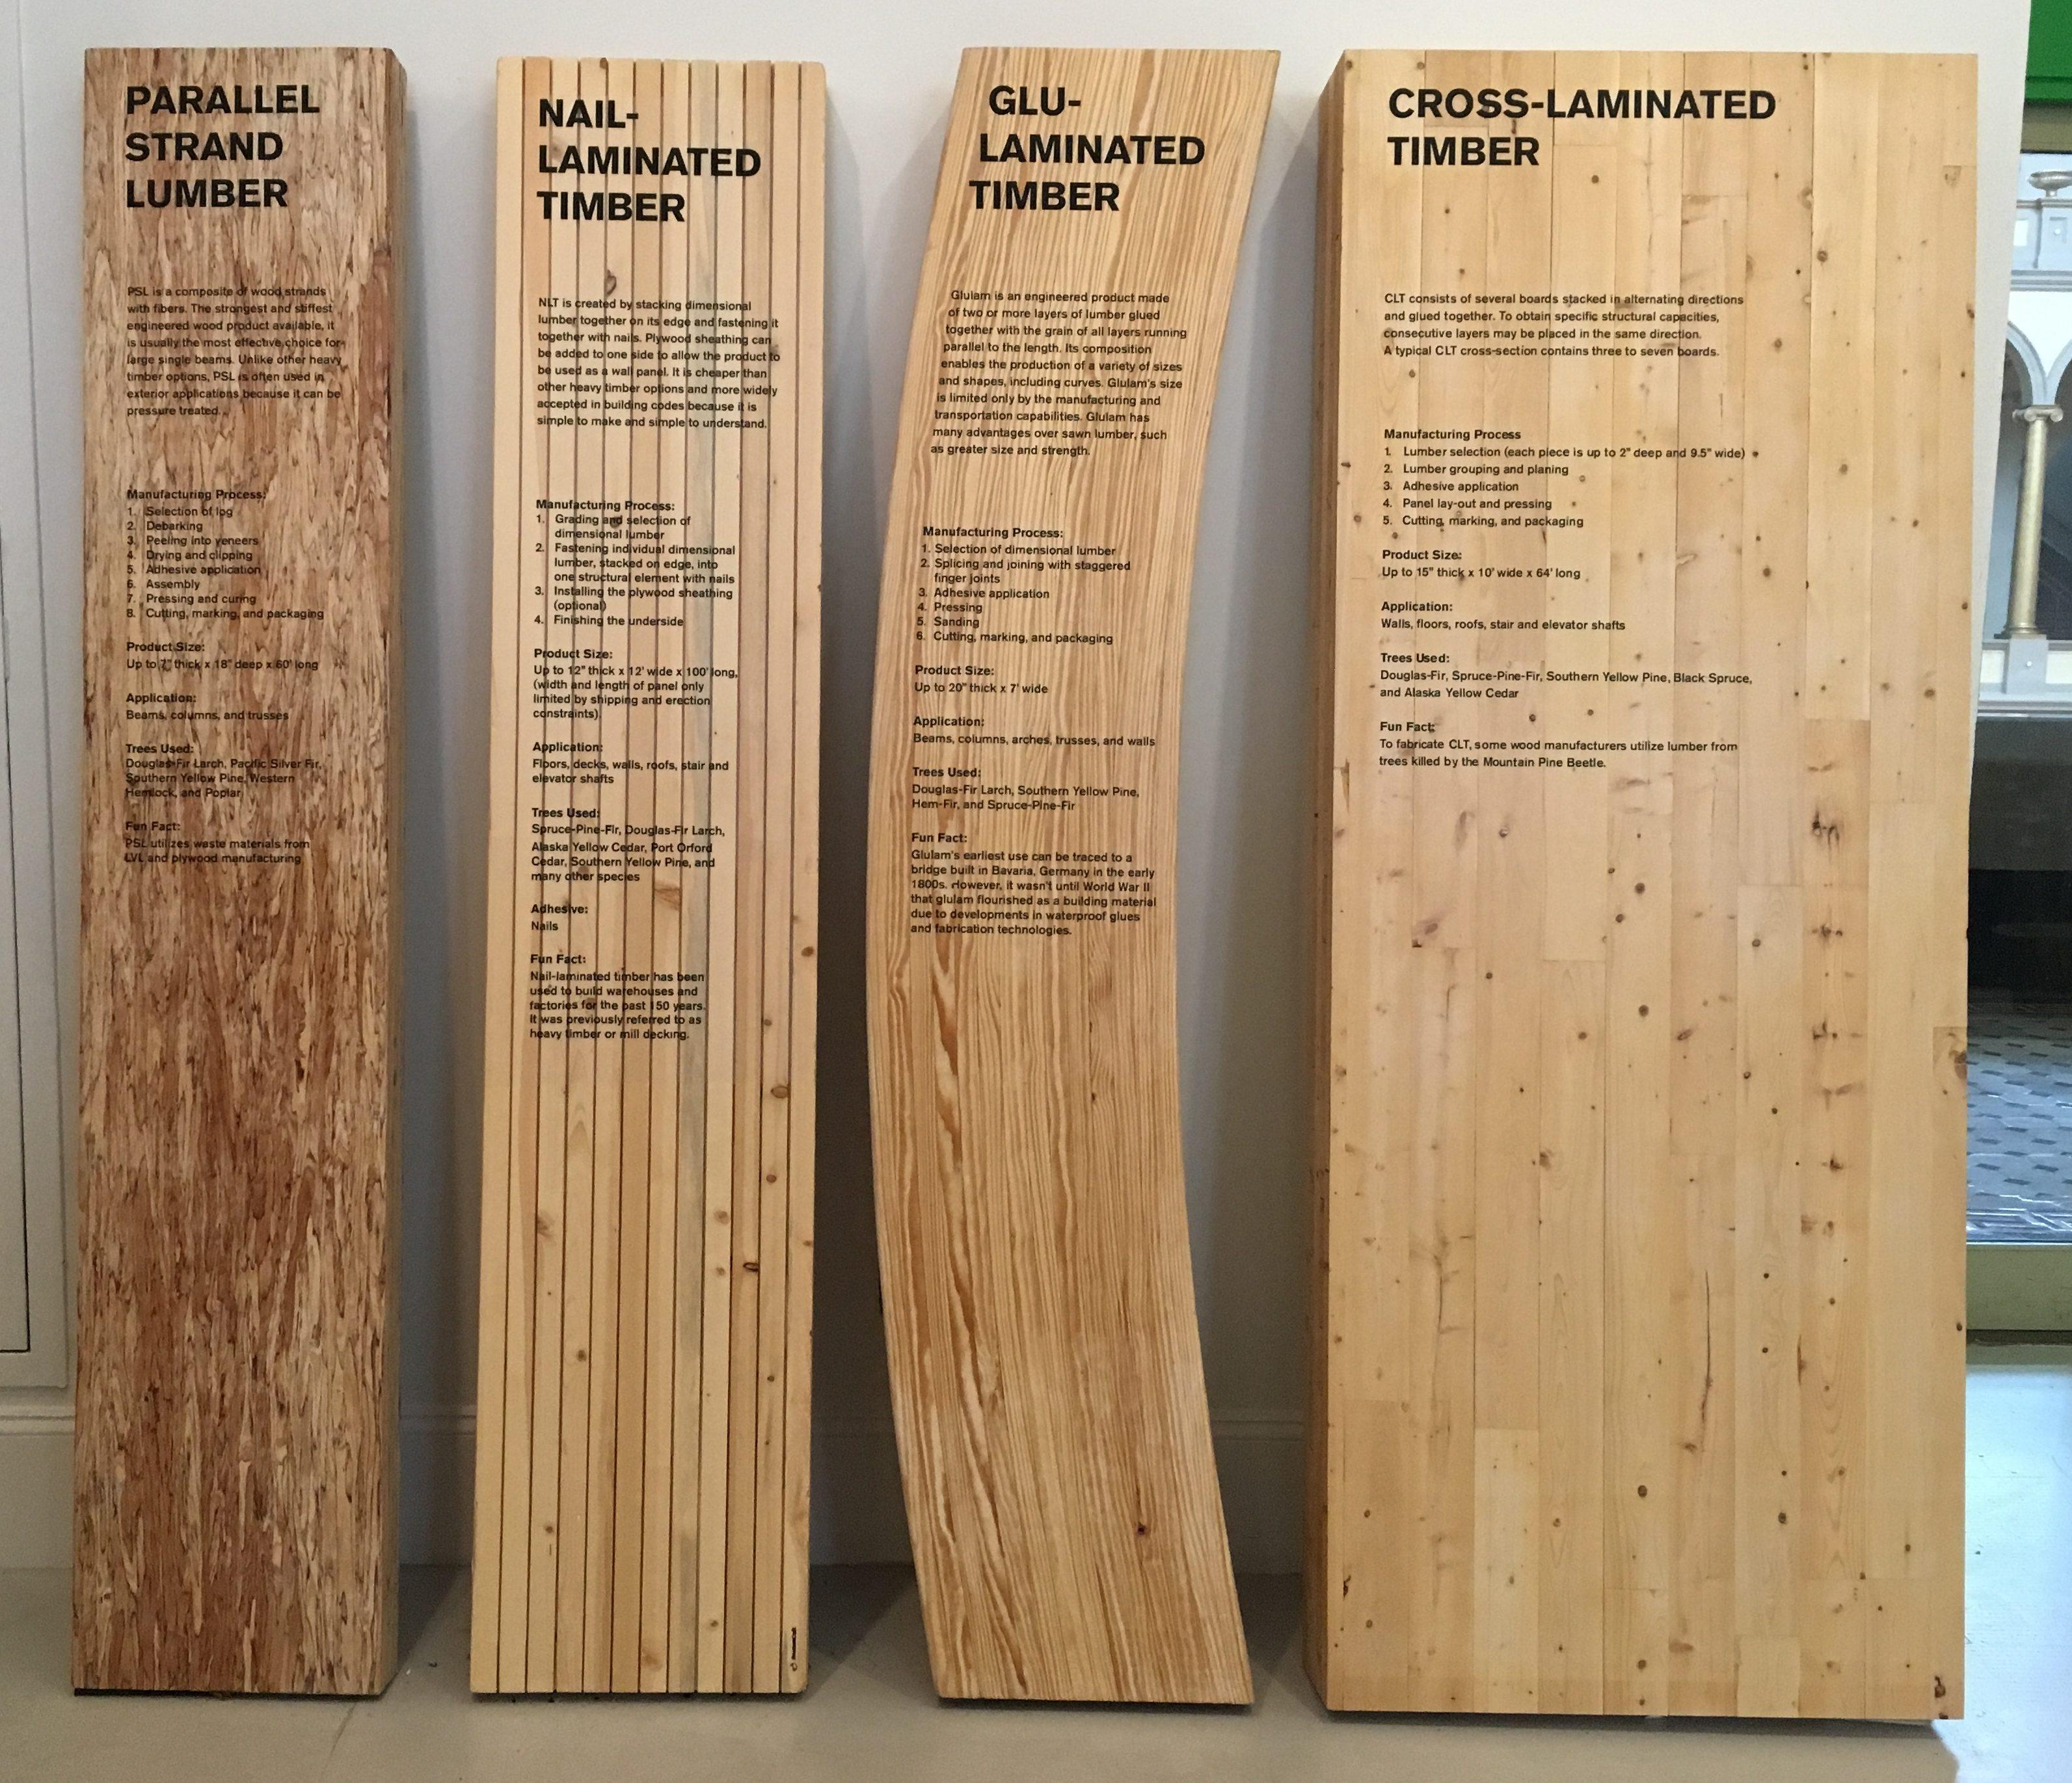 Types Of Wood Technology Cristina Davia Smart Growth